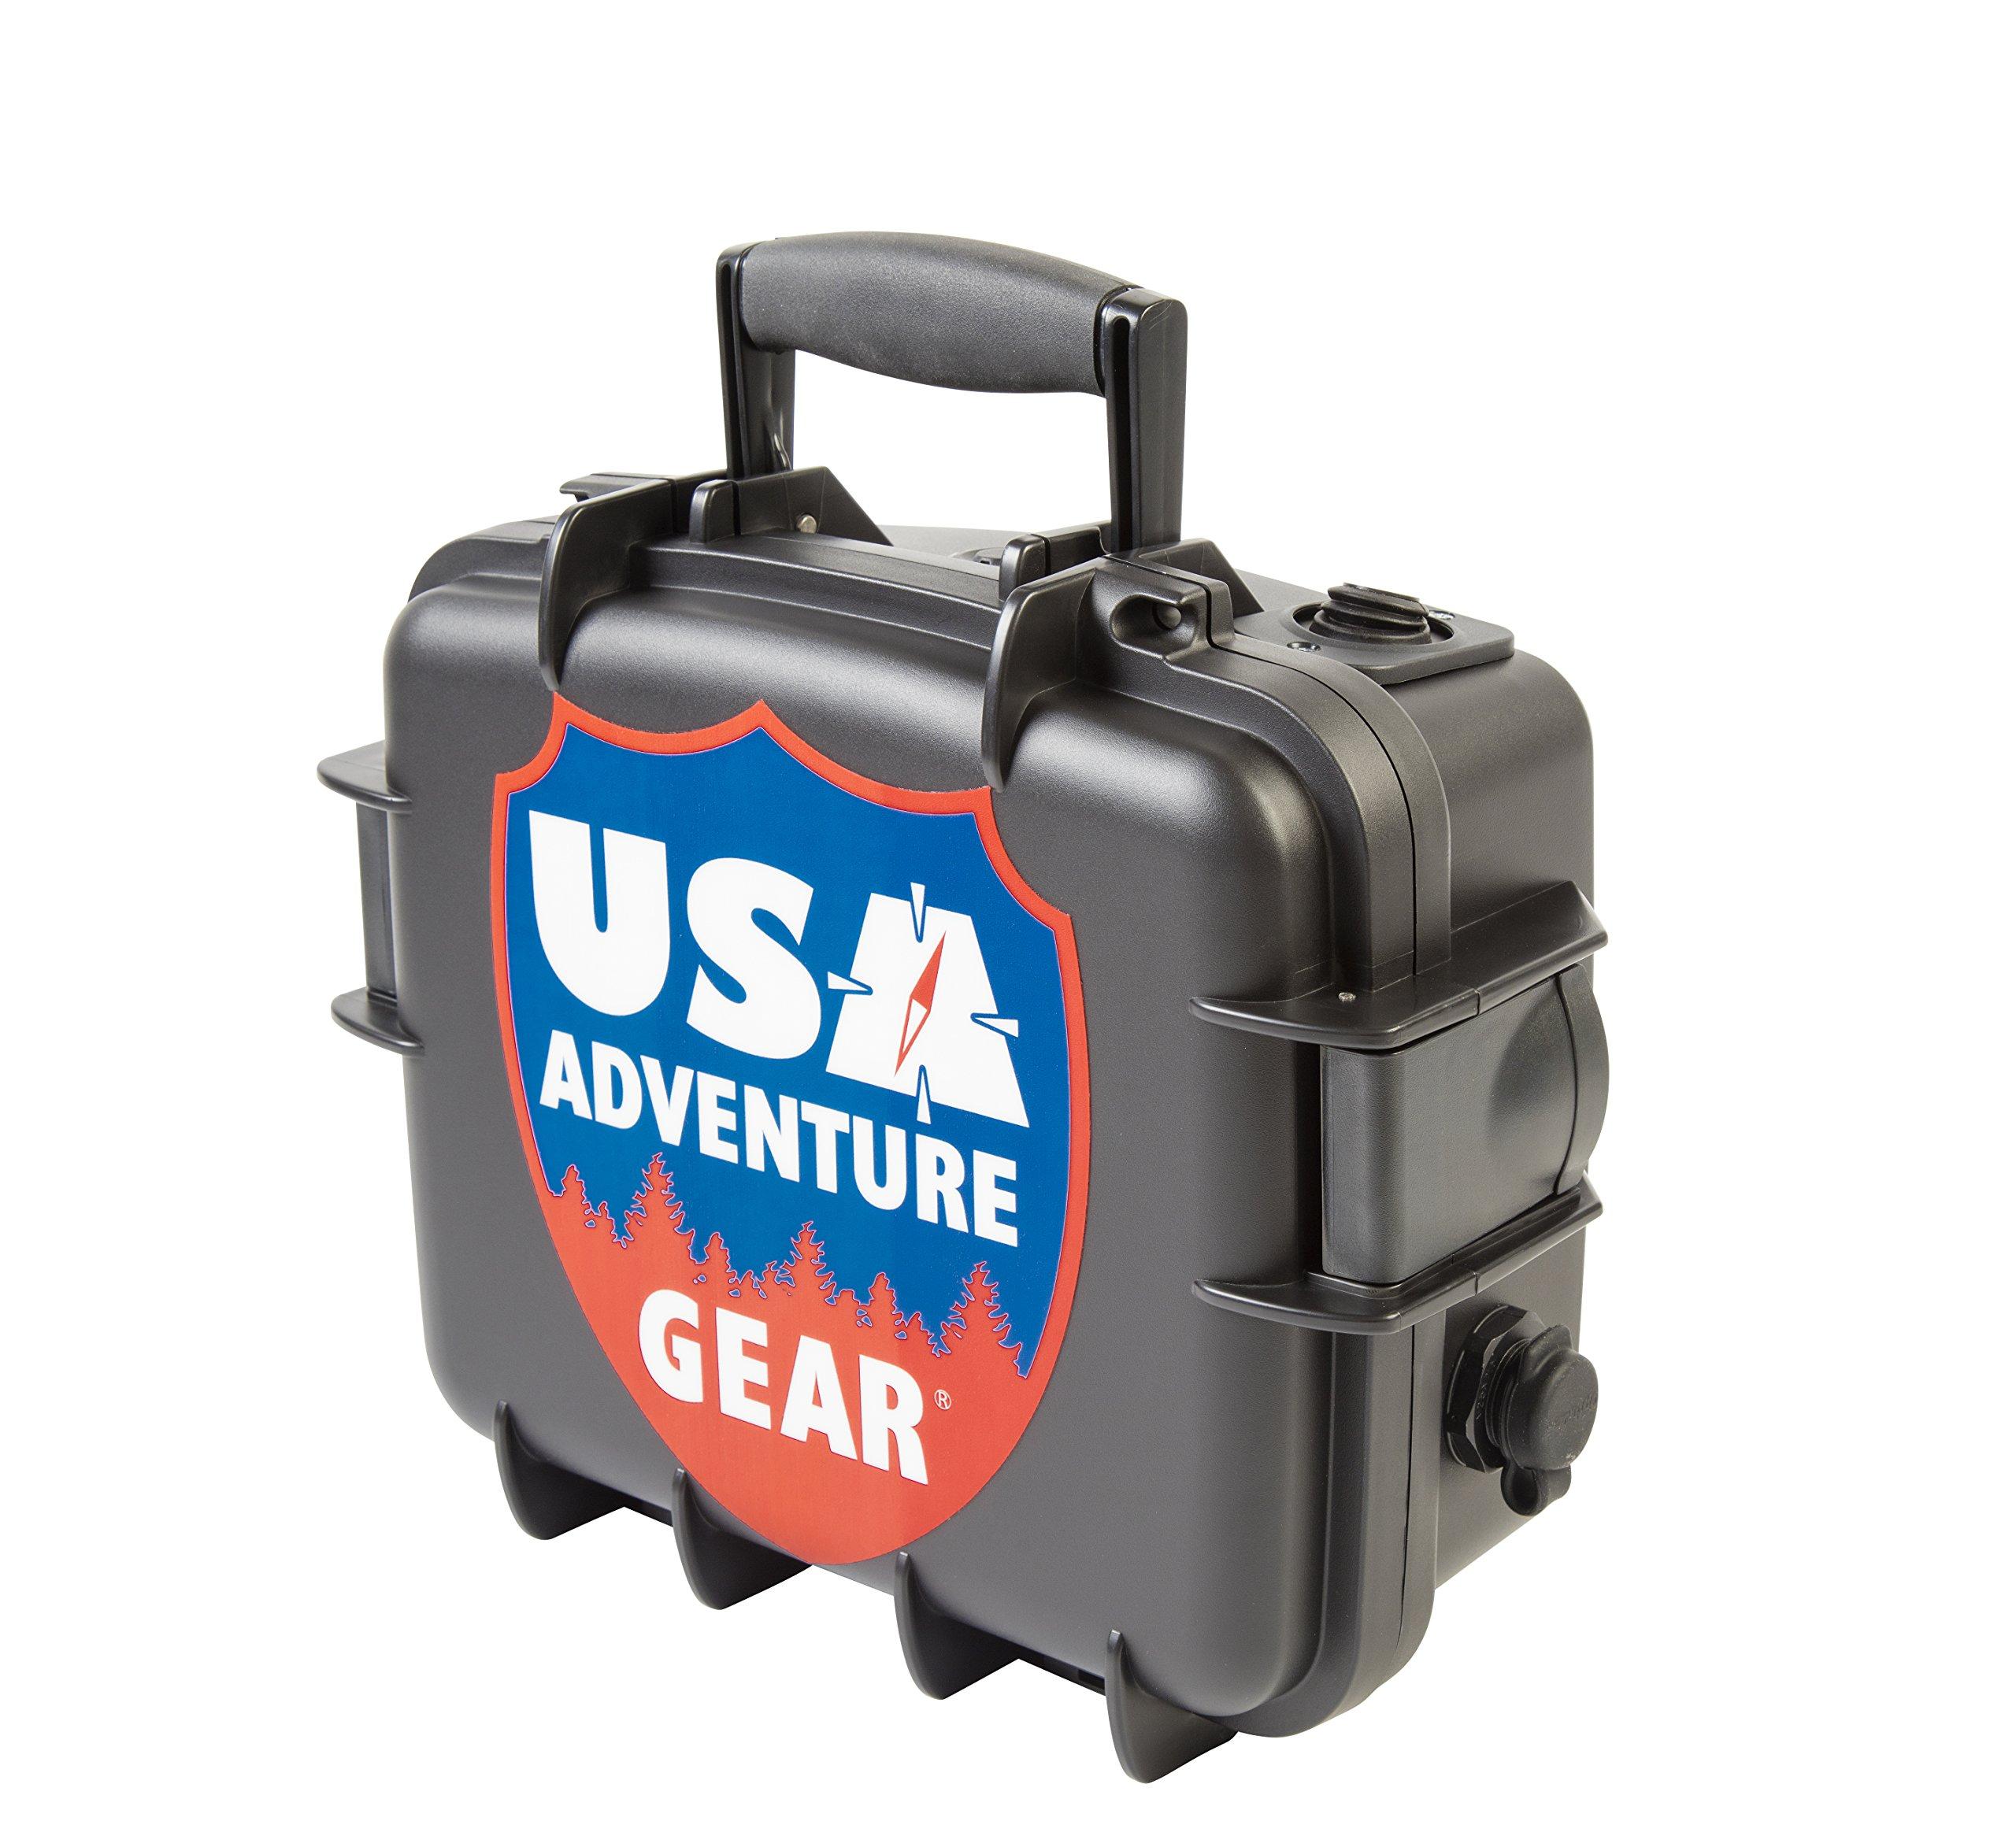 Glacier XE 12v Portable Water Pump featuring USA's 5300 ProGear Professional Grade Pump by USA Adventure Gear (Image #3)